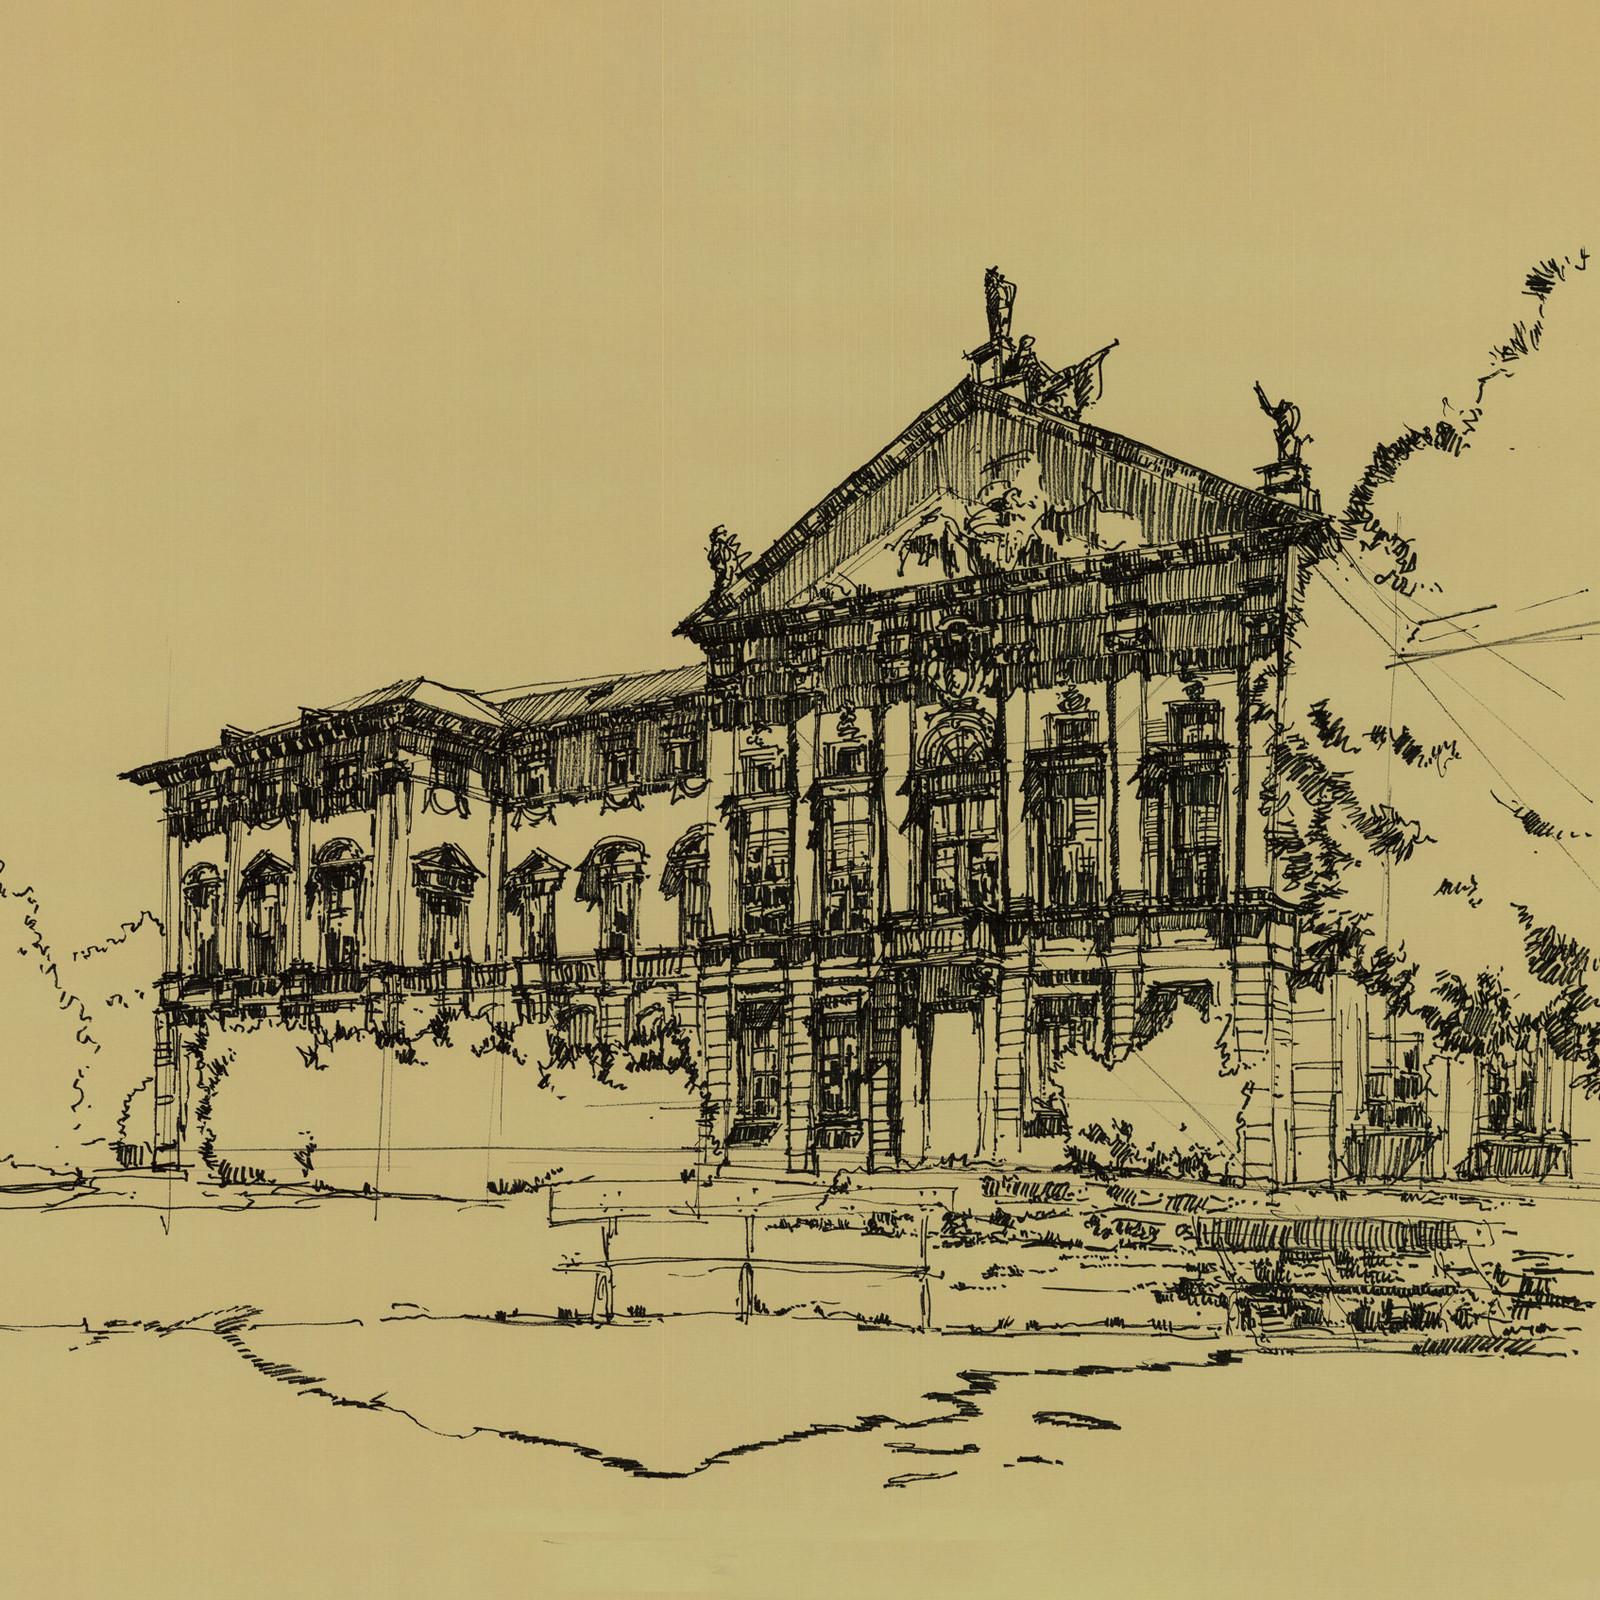 Sketches #01 - Architecture